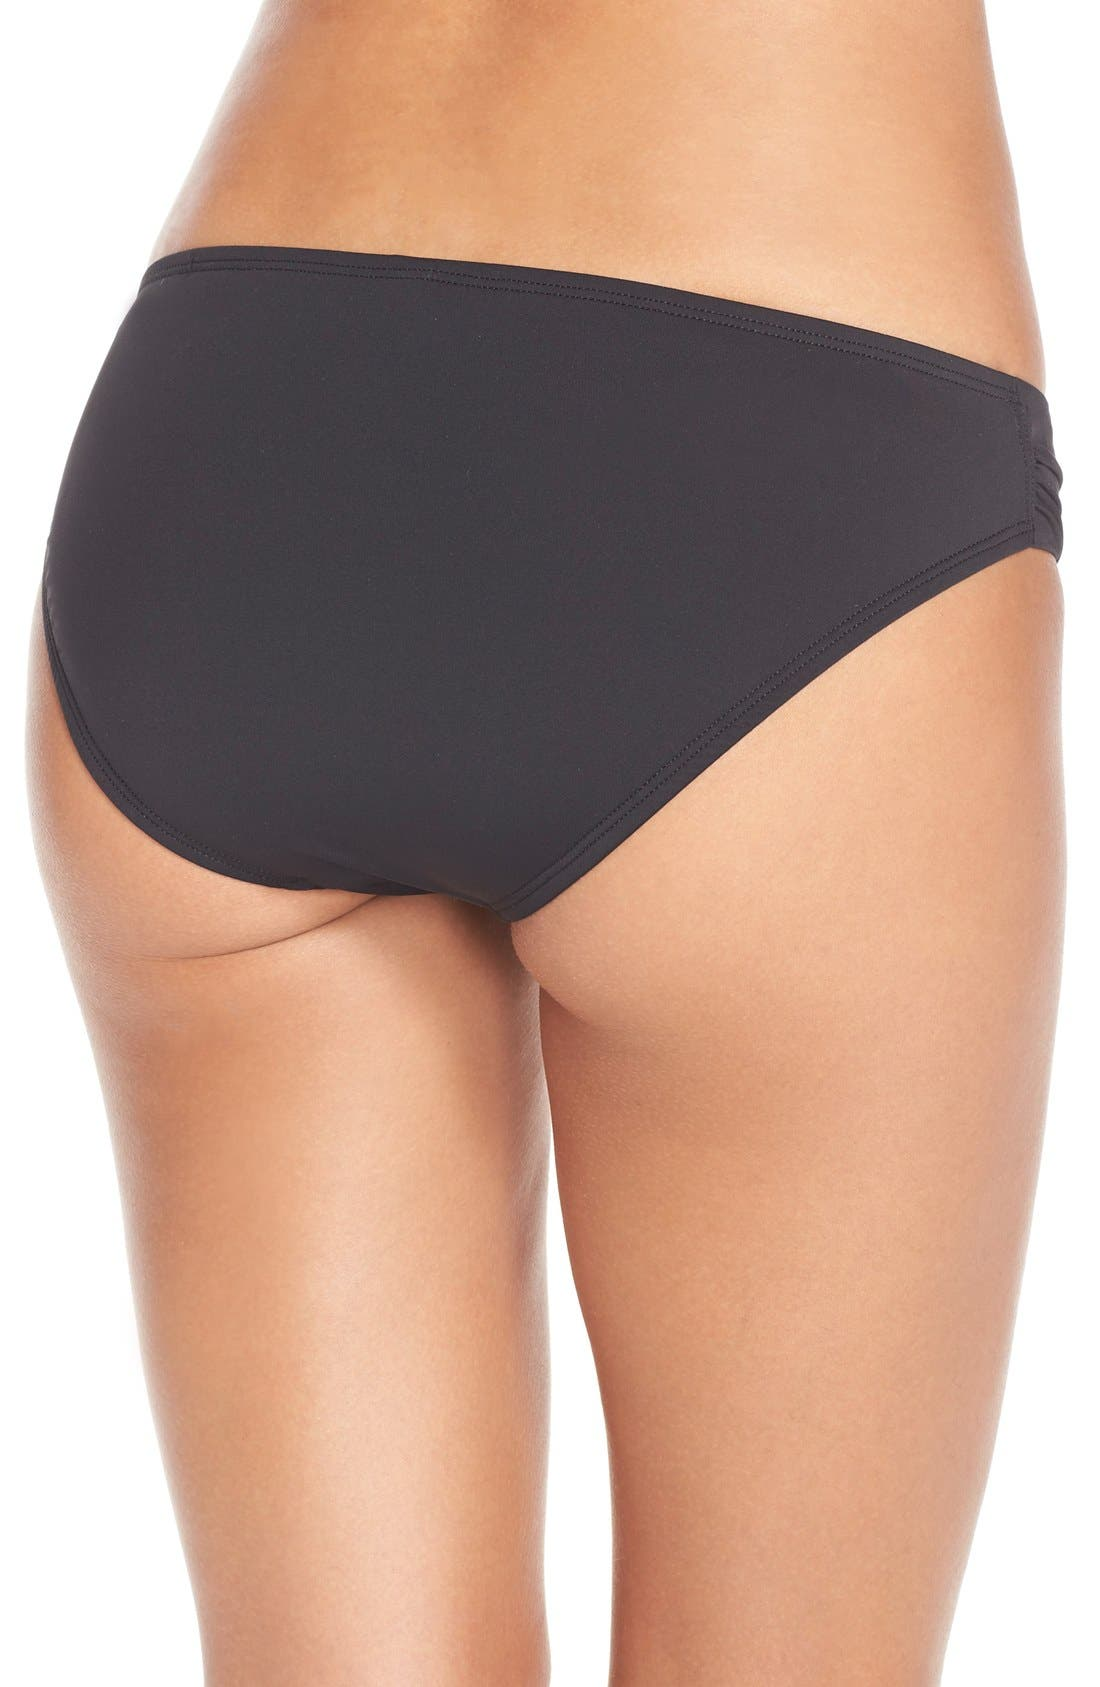 Alternate Image 2  - Tommy Bahama Side Shirred Hipster Bikini Bottoms